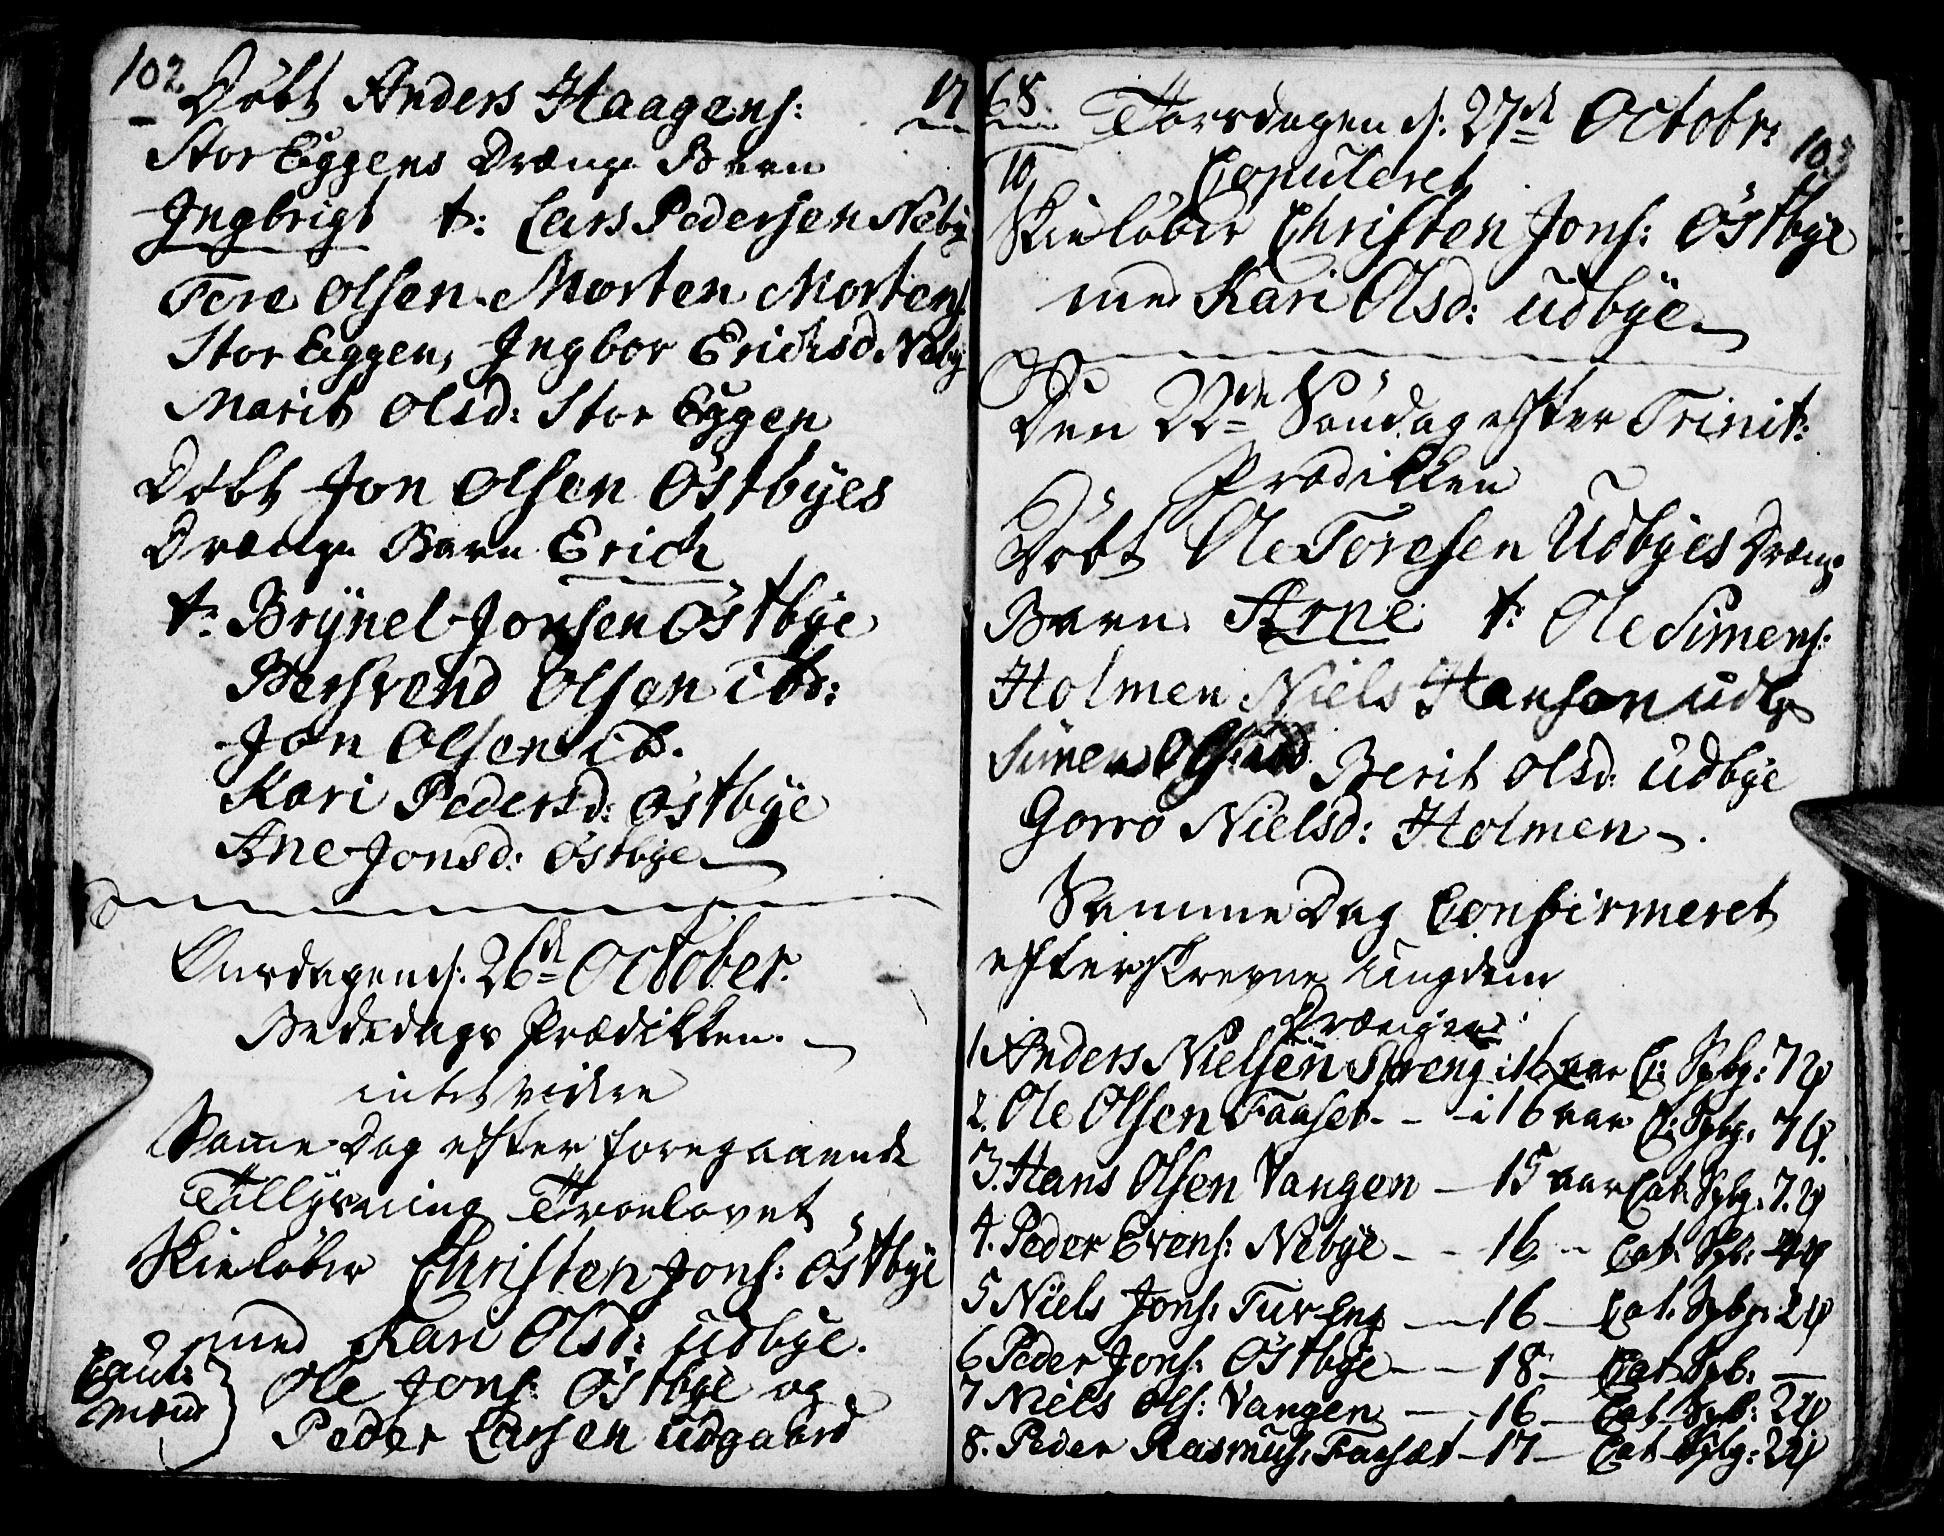 SAH, Tynset prestekontor, Ministerialbok nr. 6, 1763-1779, s. 102-103